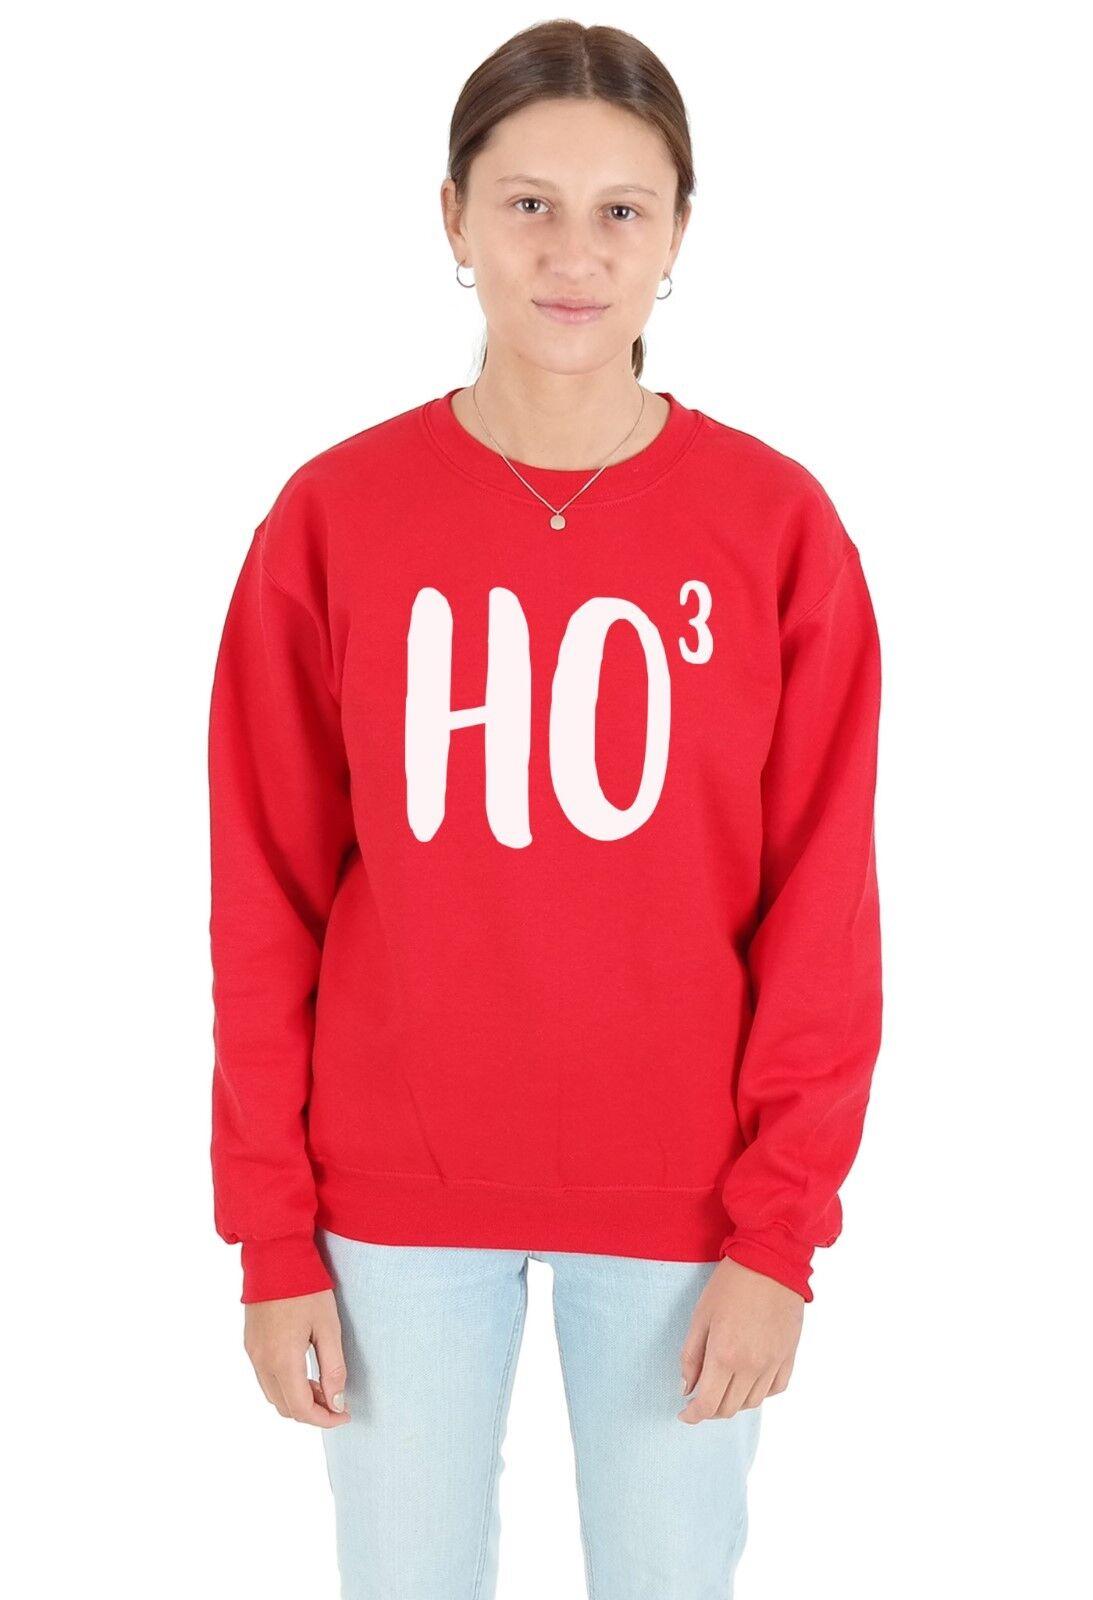 Sudadera Jumper Top Suéter HO3 Navidad Navidad Santa Gracioso HoHoHo Santa Navidad mínima Ho 3 e172b7